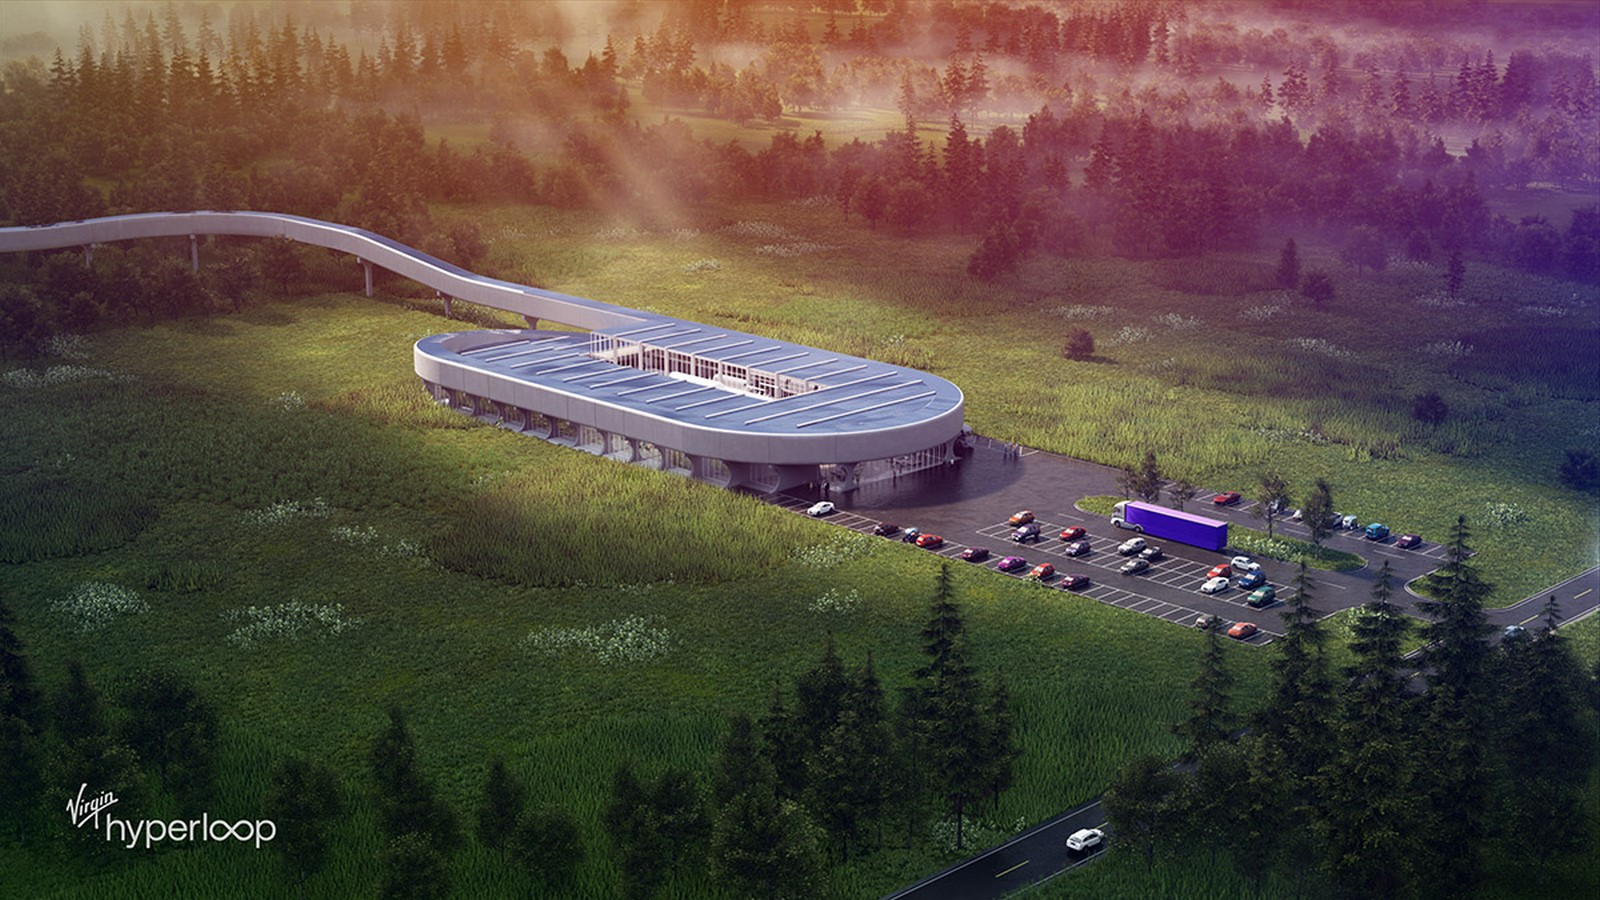 Virgin Hyperloop Certification Center for West Virginia designs revealed by BIG - Sheet4